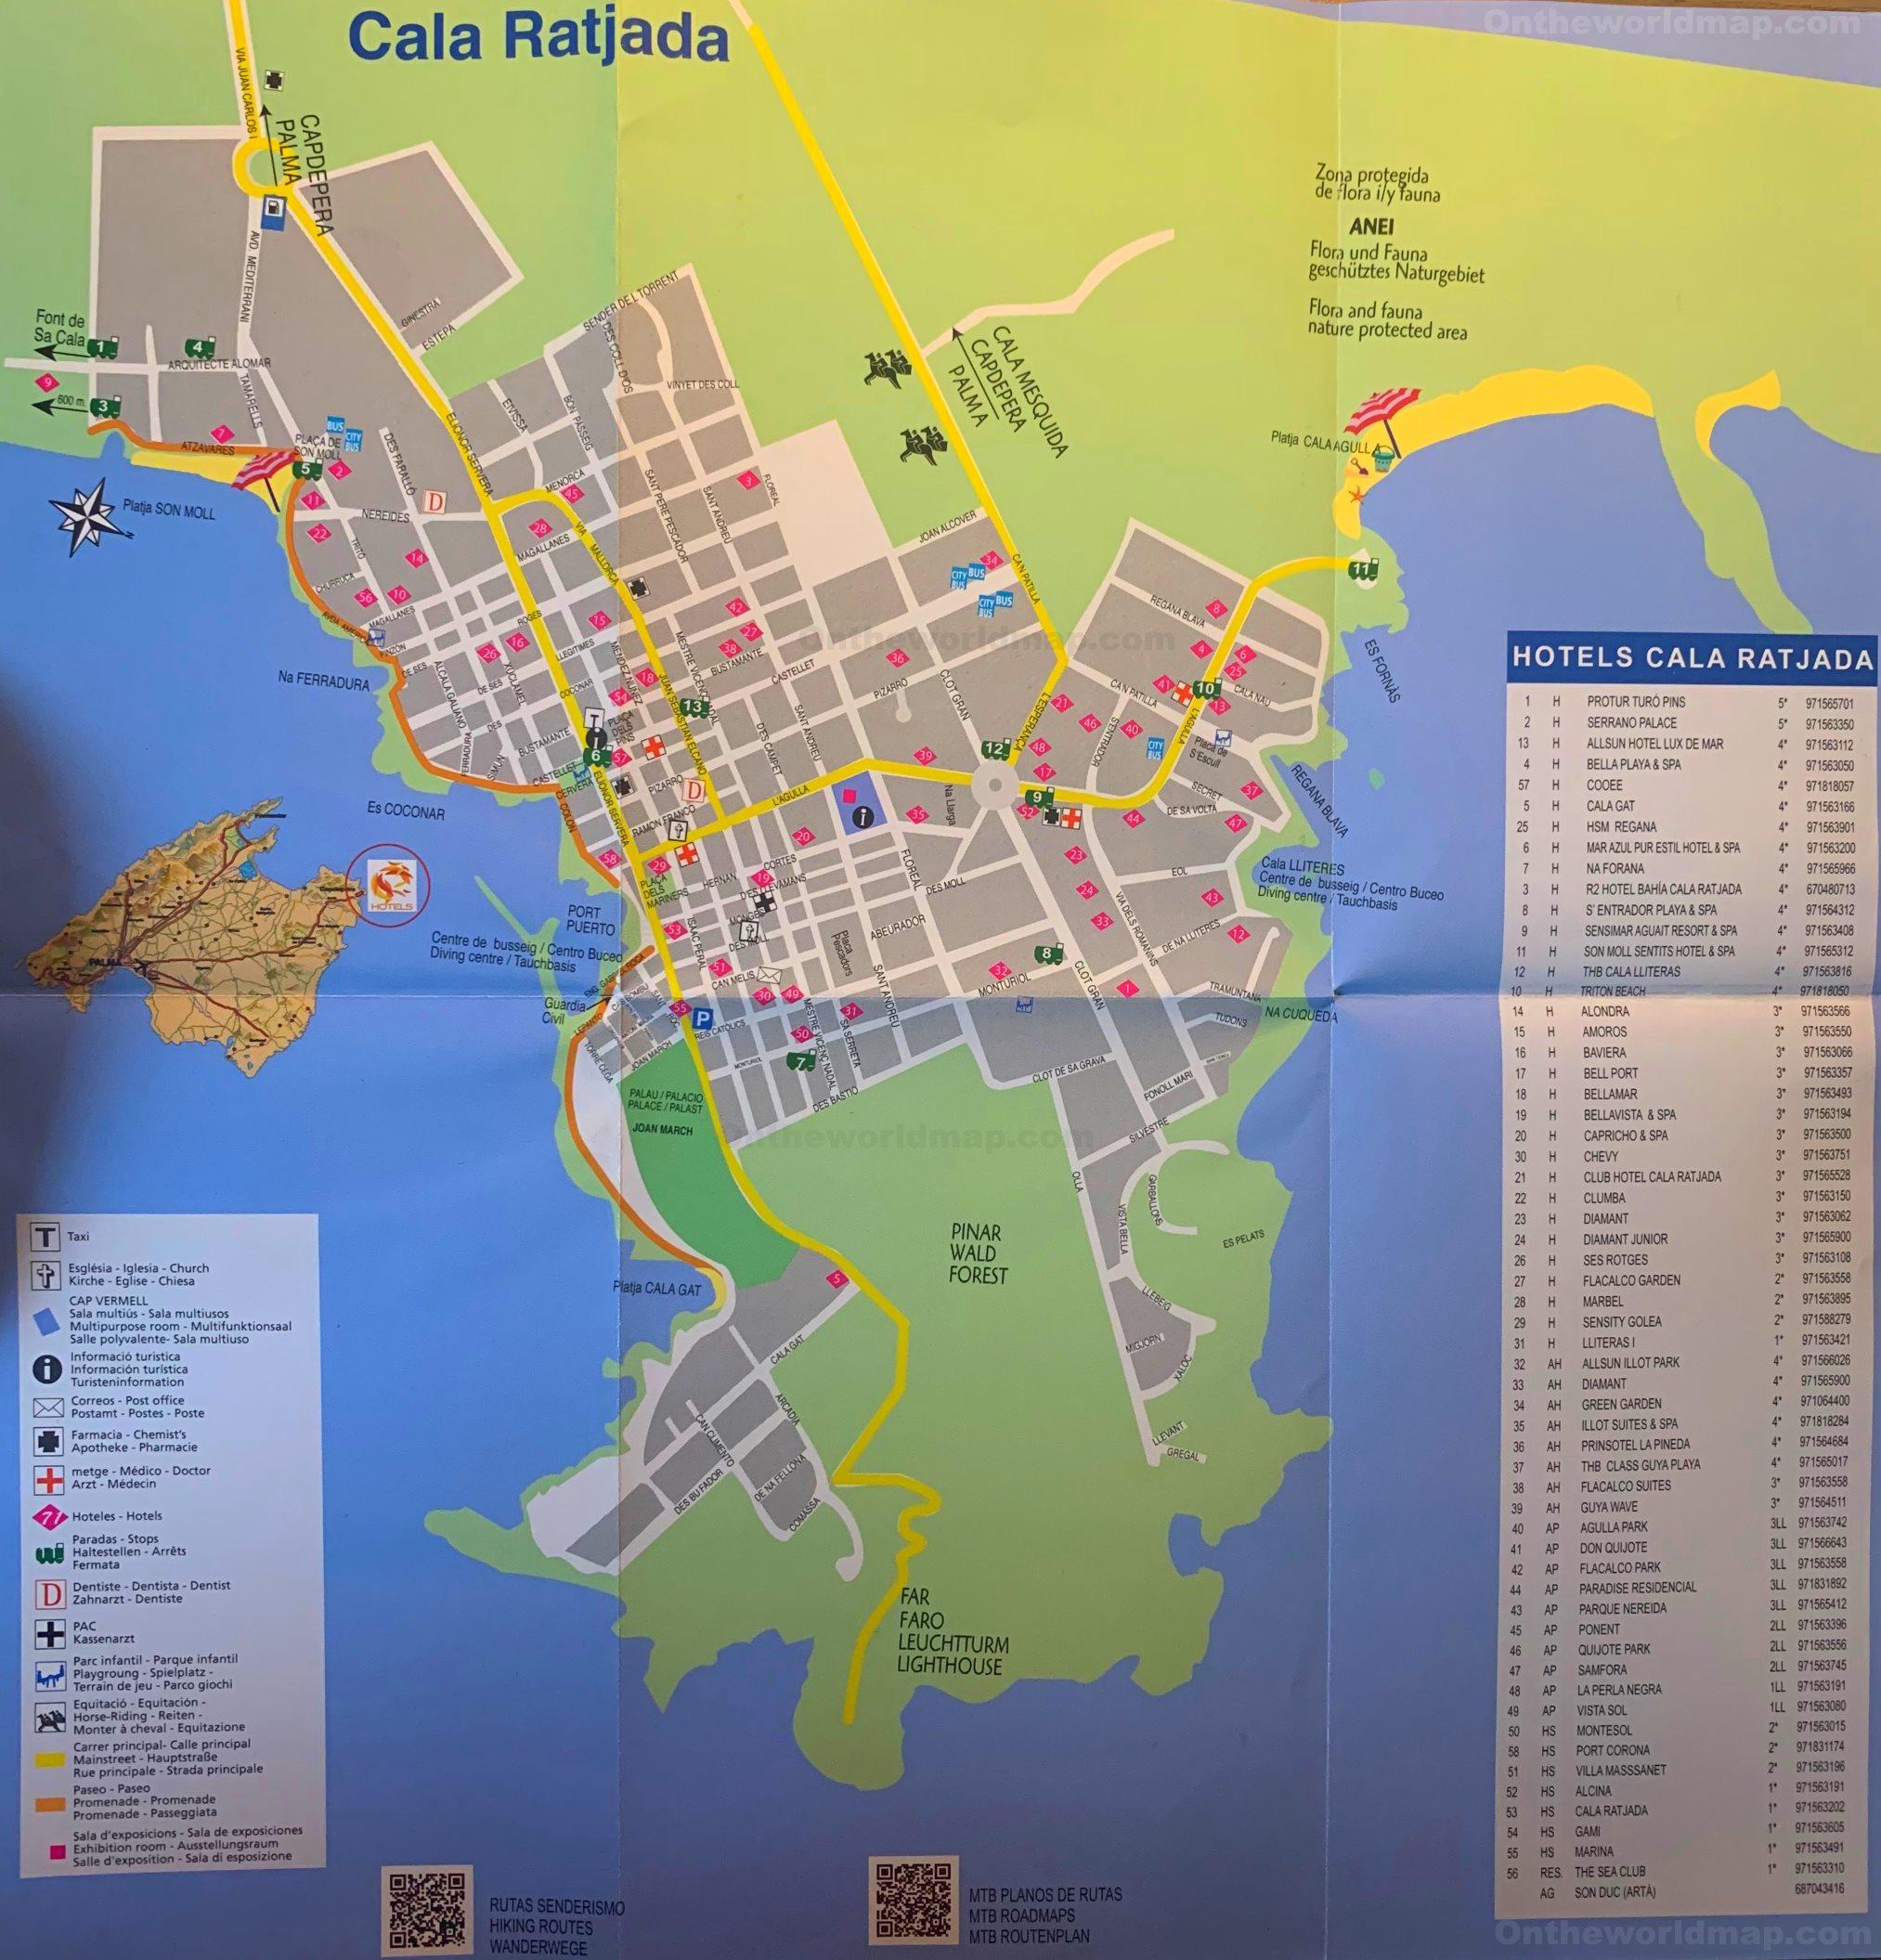 Cala Ratjada Karte.Cala Ratjada Tourist Map